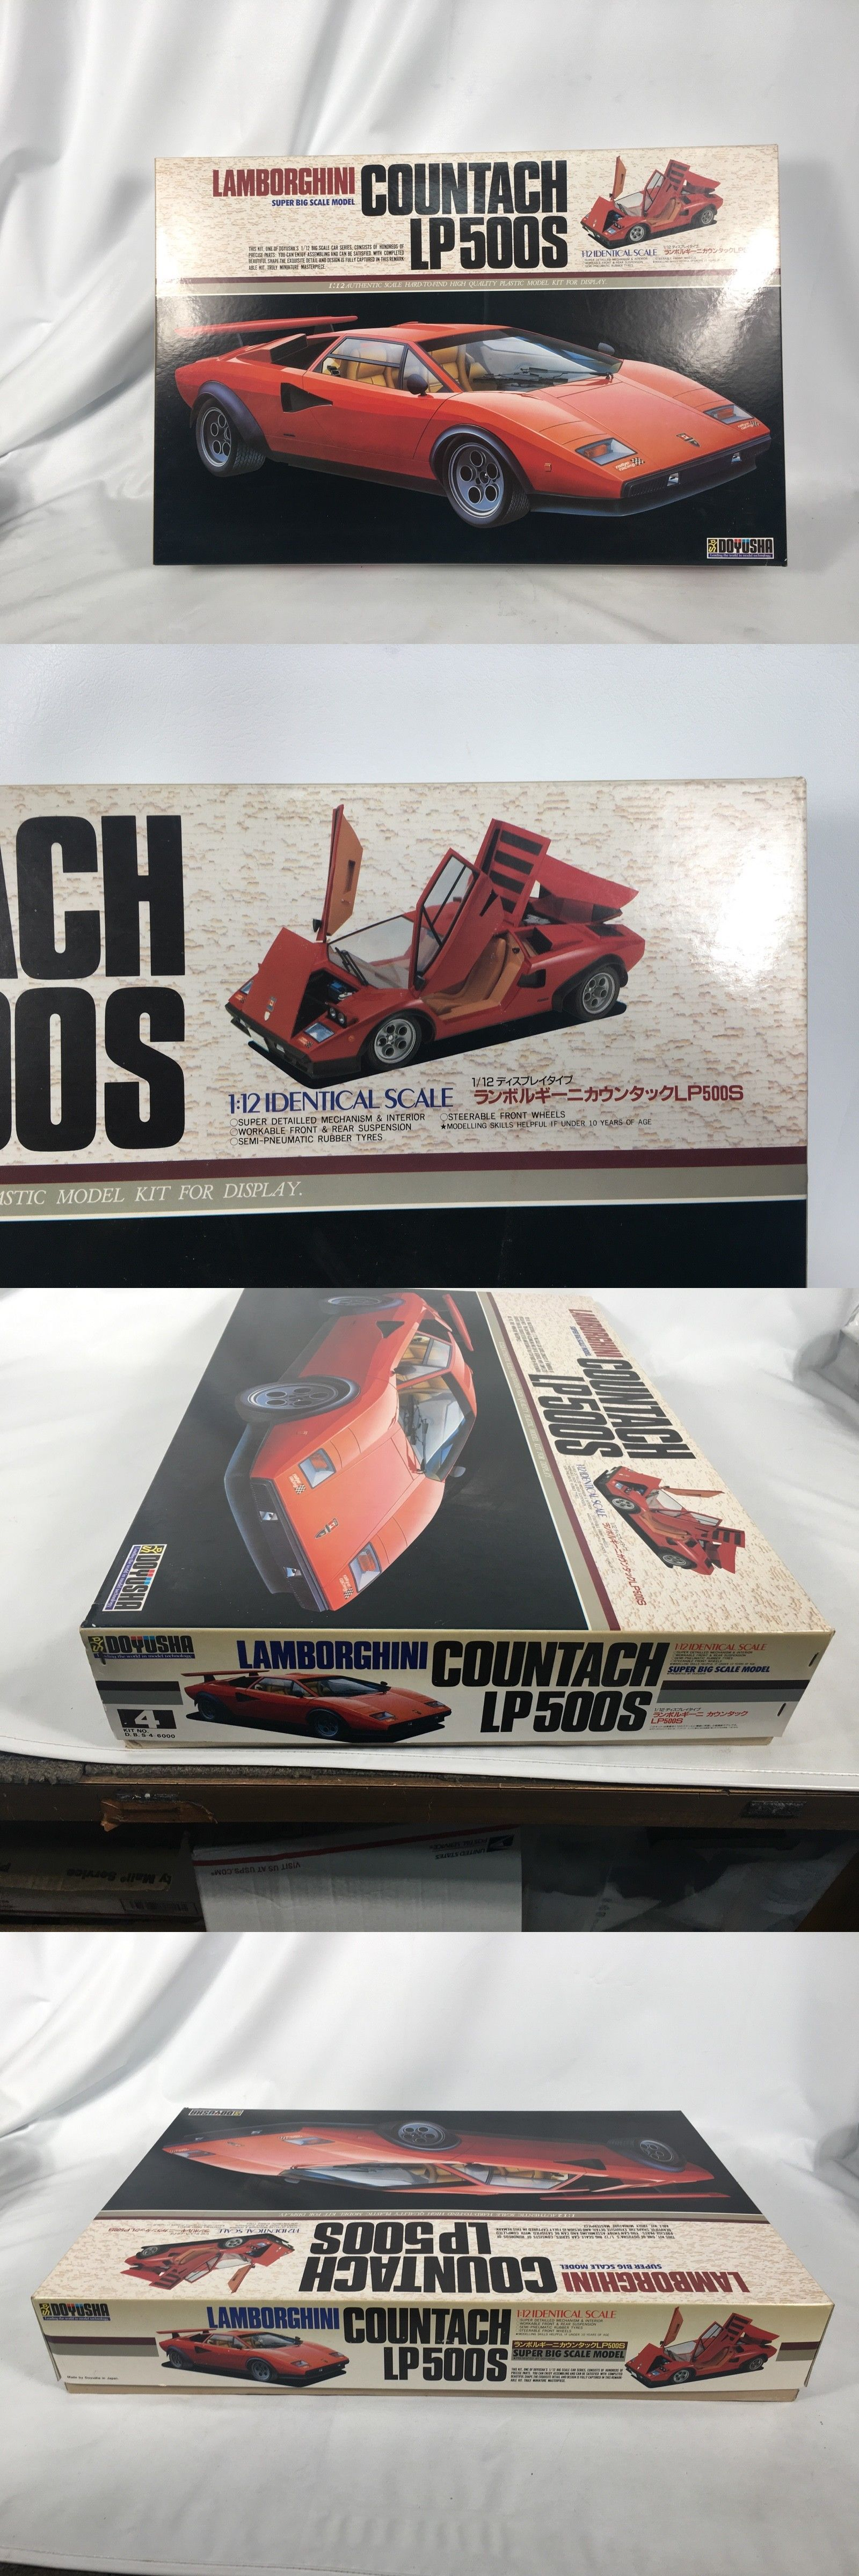 1 12 Scale 145972 Doyusha Lamborghini Countach 1 12 Scale Model Car